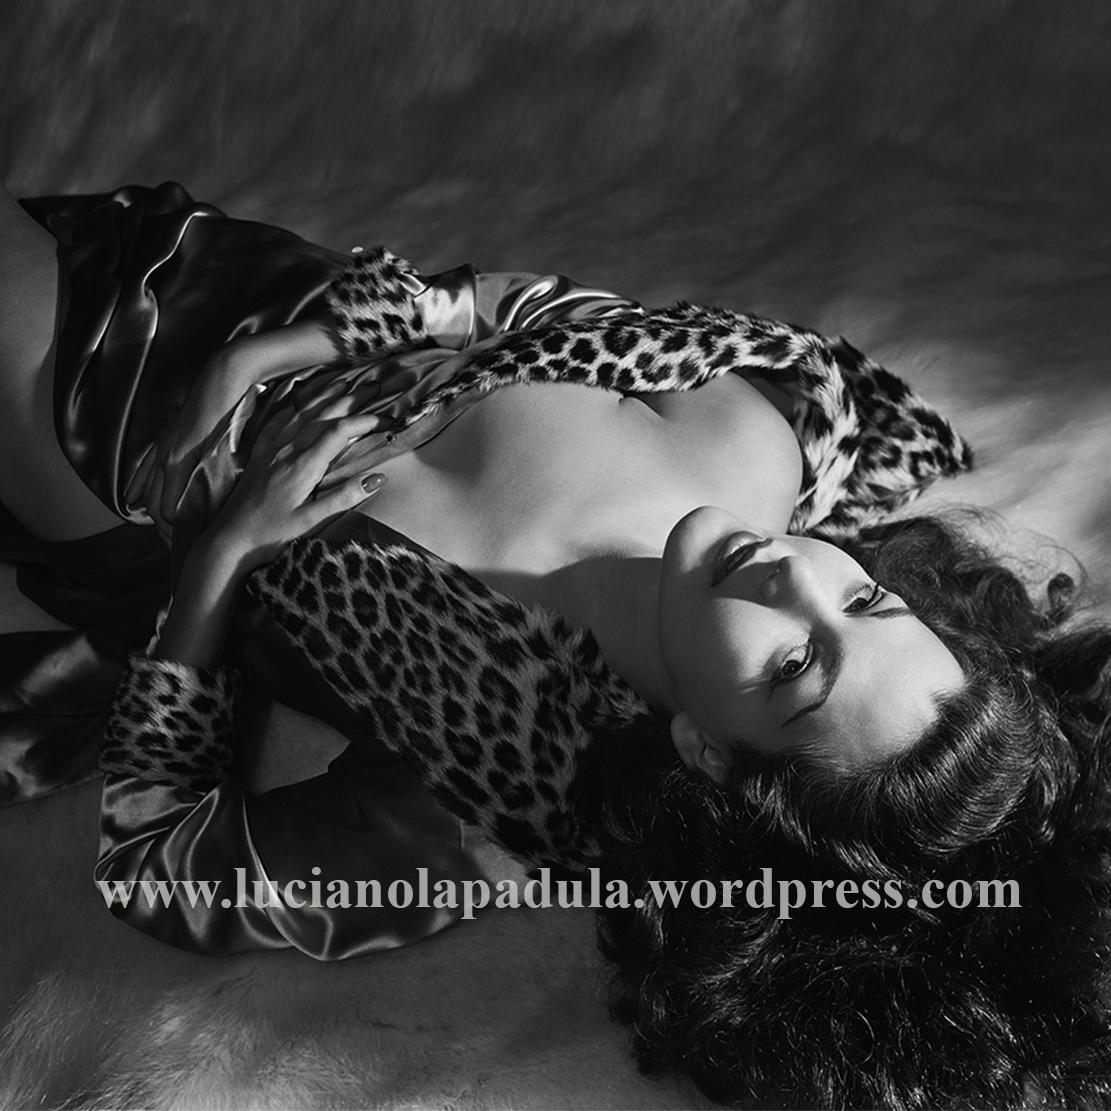 maria montez history fashion cinema luciano lapadula old hollywood blog scrittore blogger moda insegnante historian 1 photography pinup animalier leopard